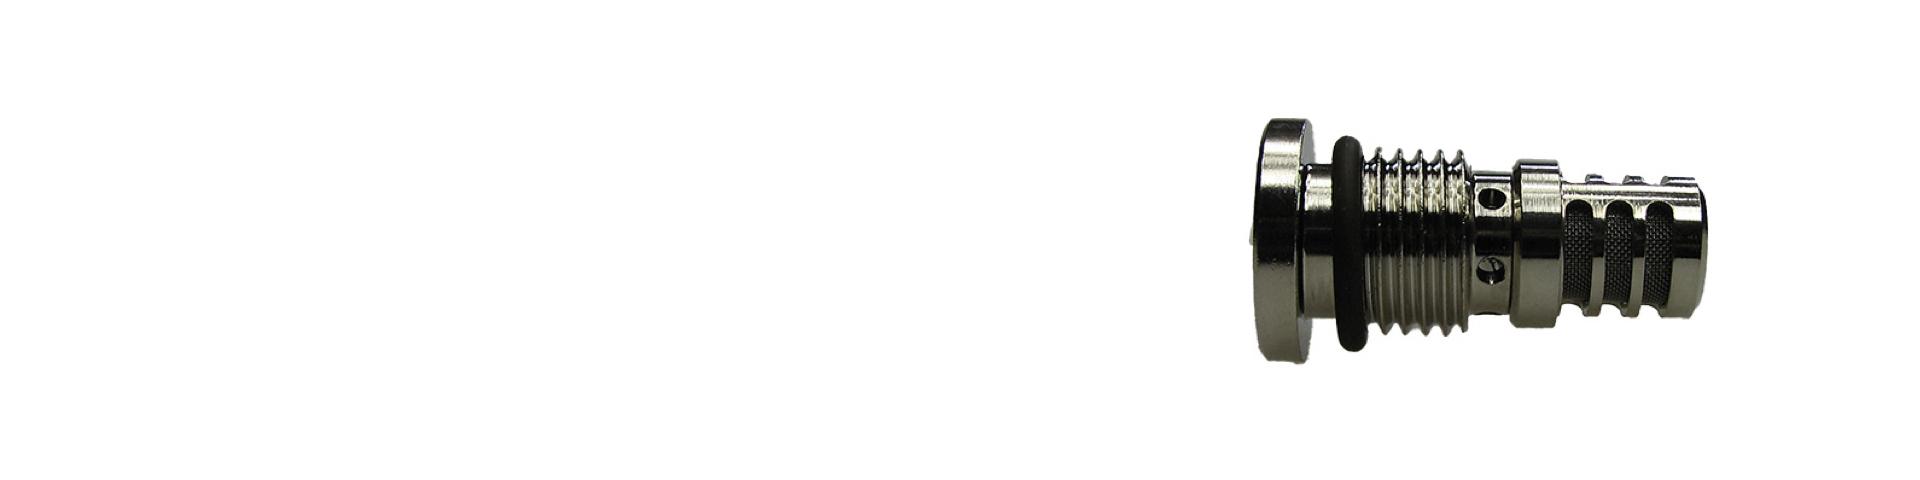 Filtr do Aplikatora Nordson MiniBlue